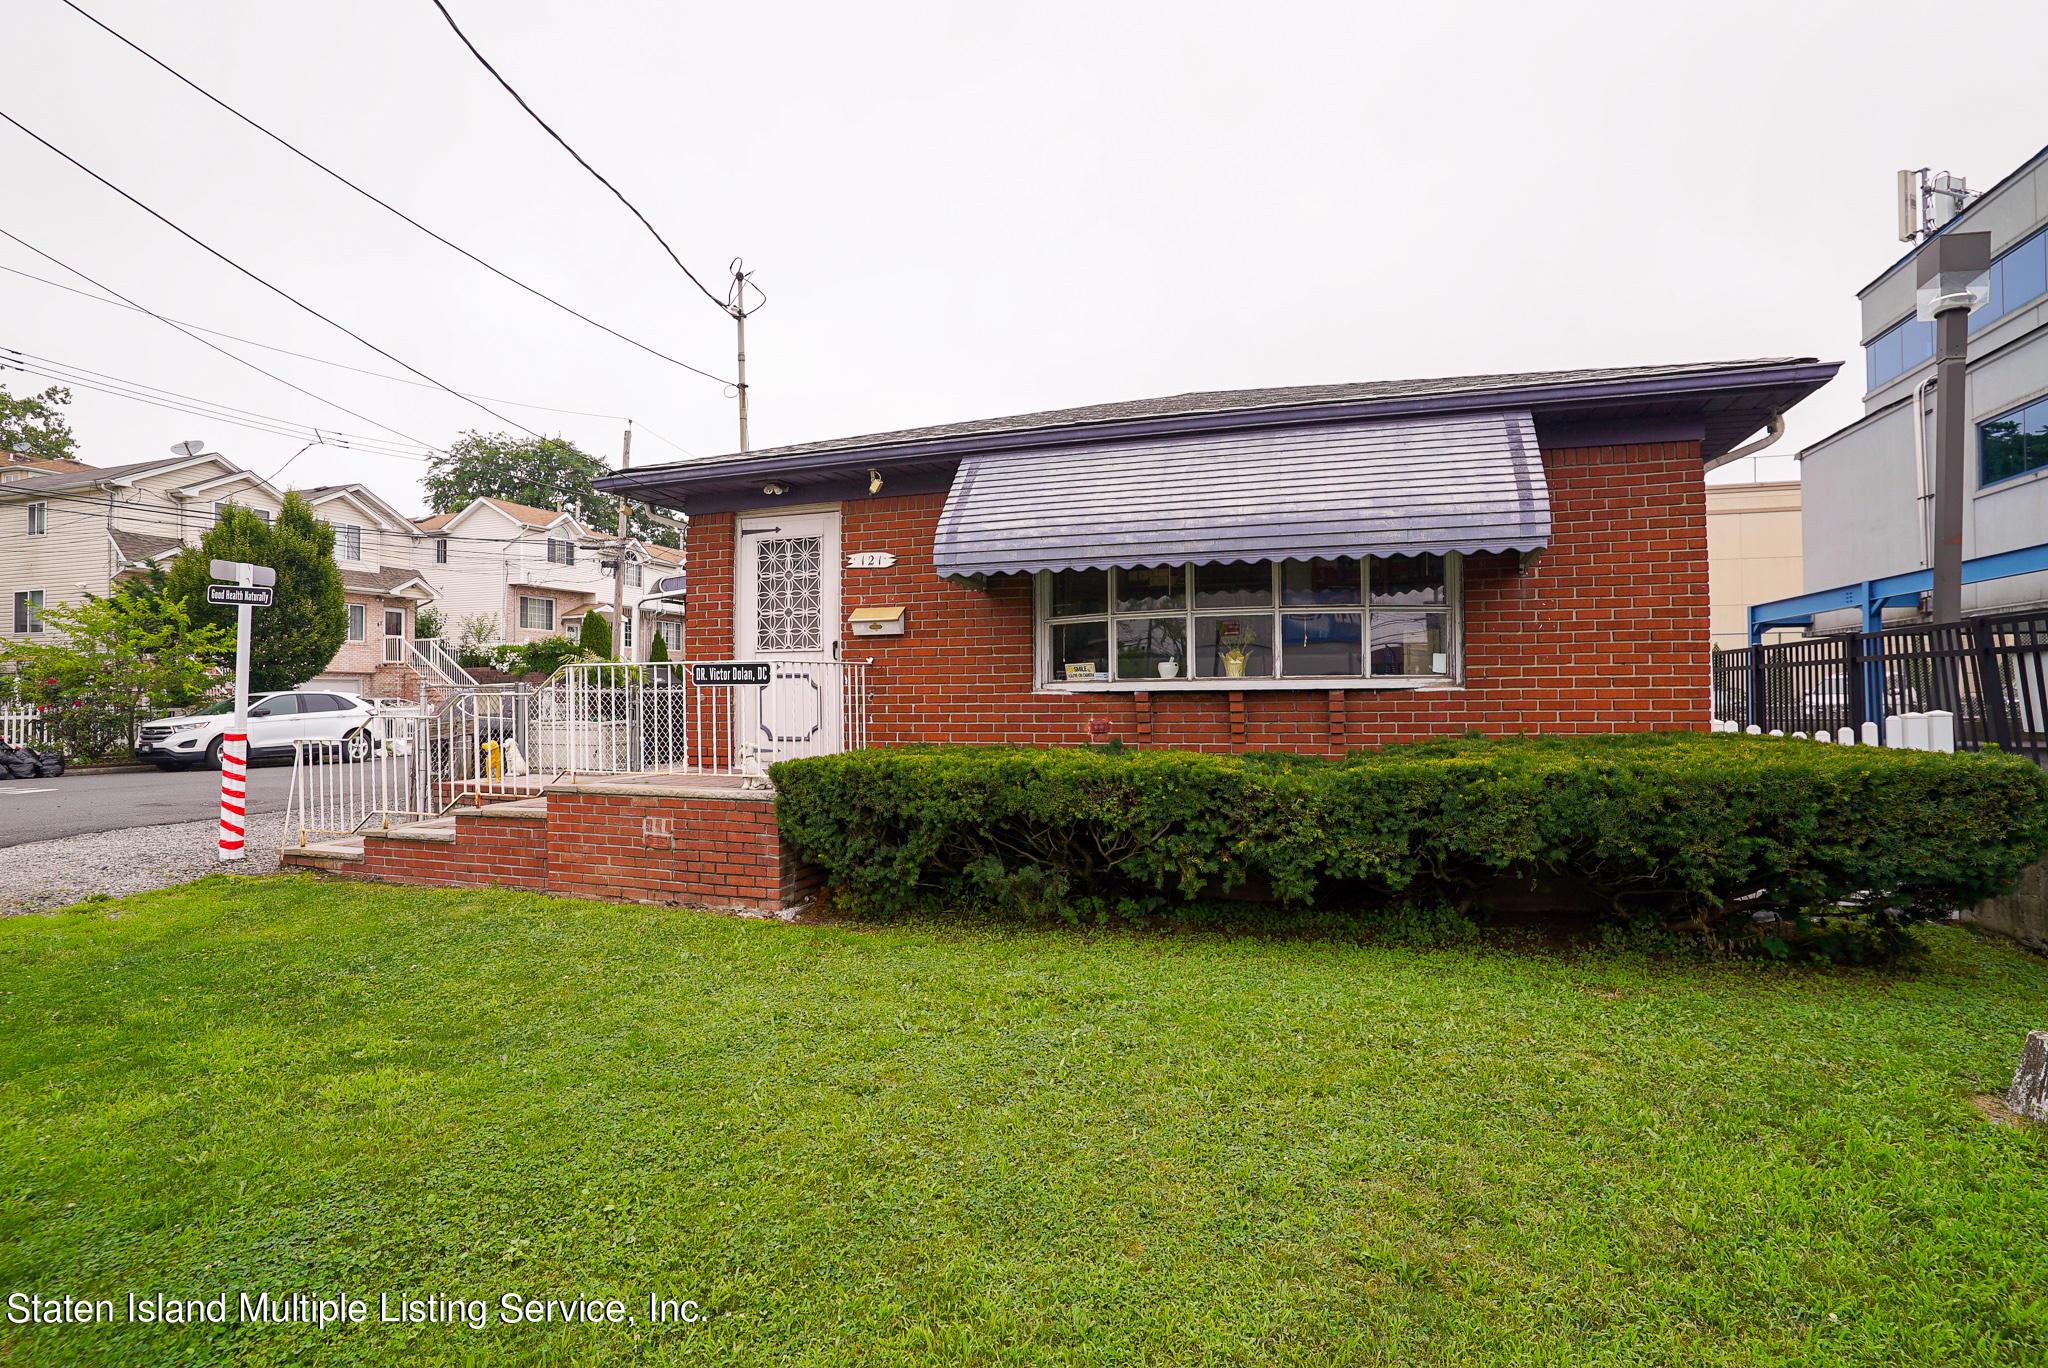 Single Family - Detached 121 Parkinson Avenue  Staten Island, NY 10305, MLS-1147747-3